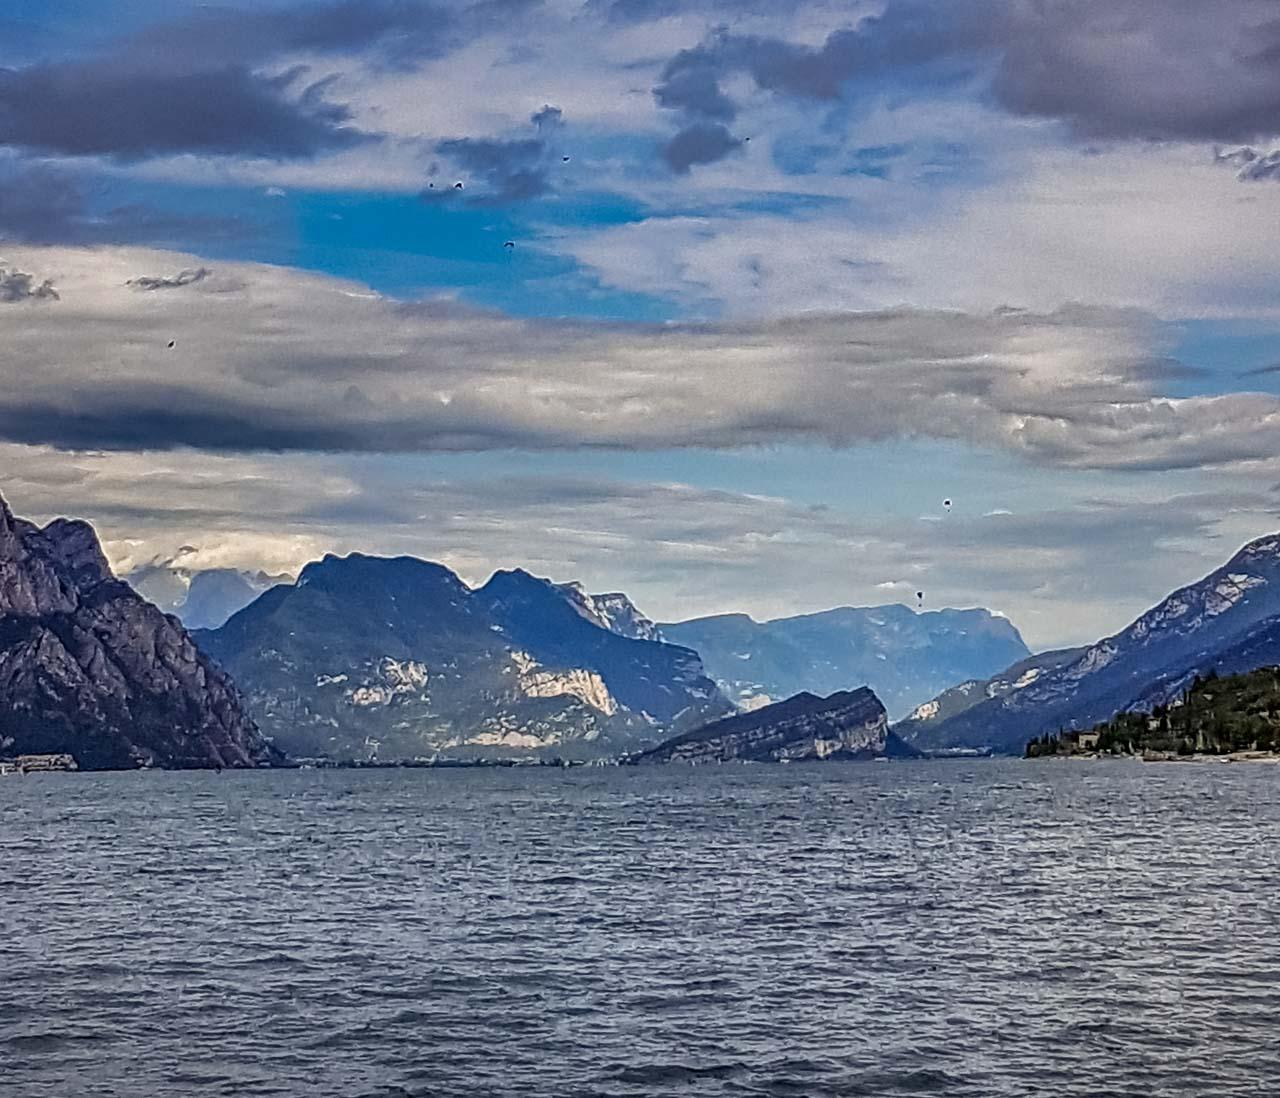 20170915_133504 Lake Garda (Lago di Garda) - Italy